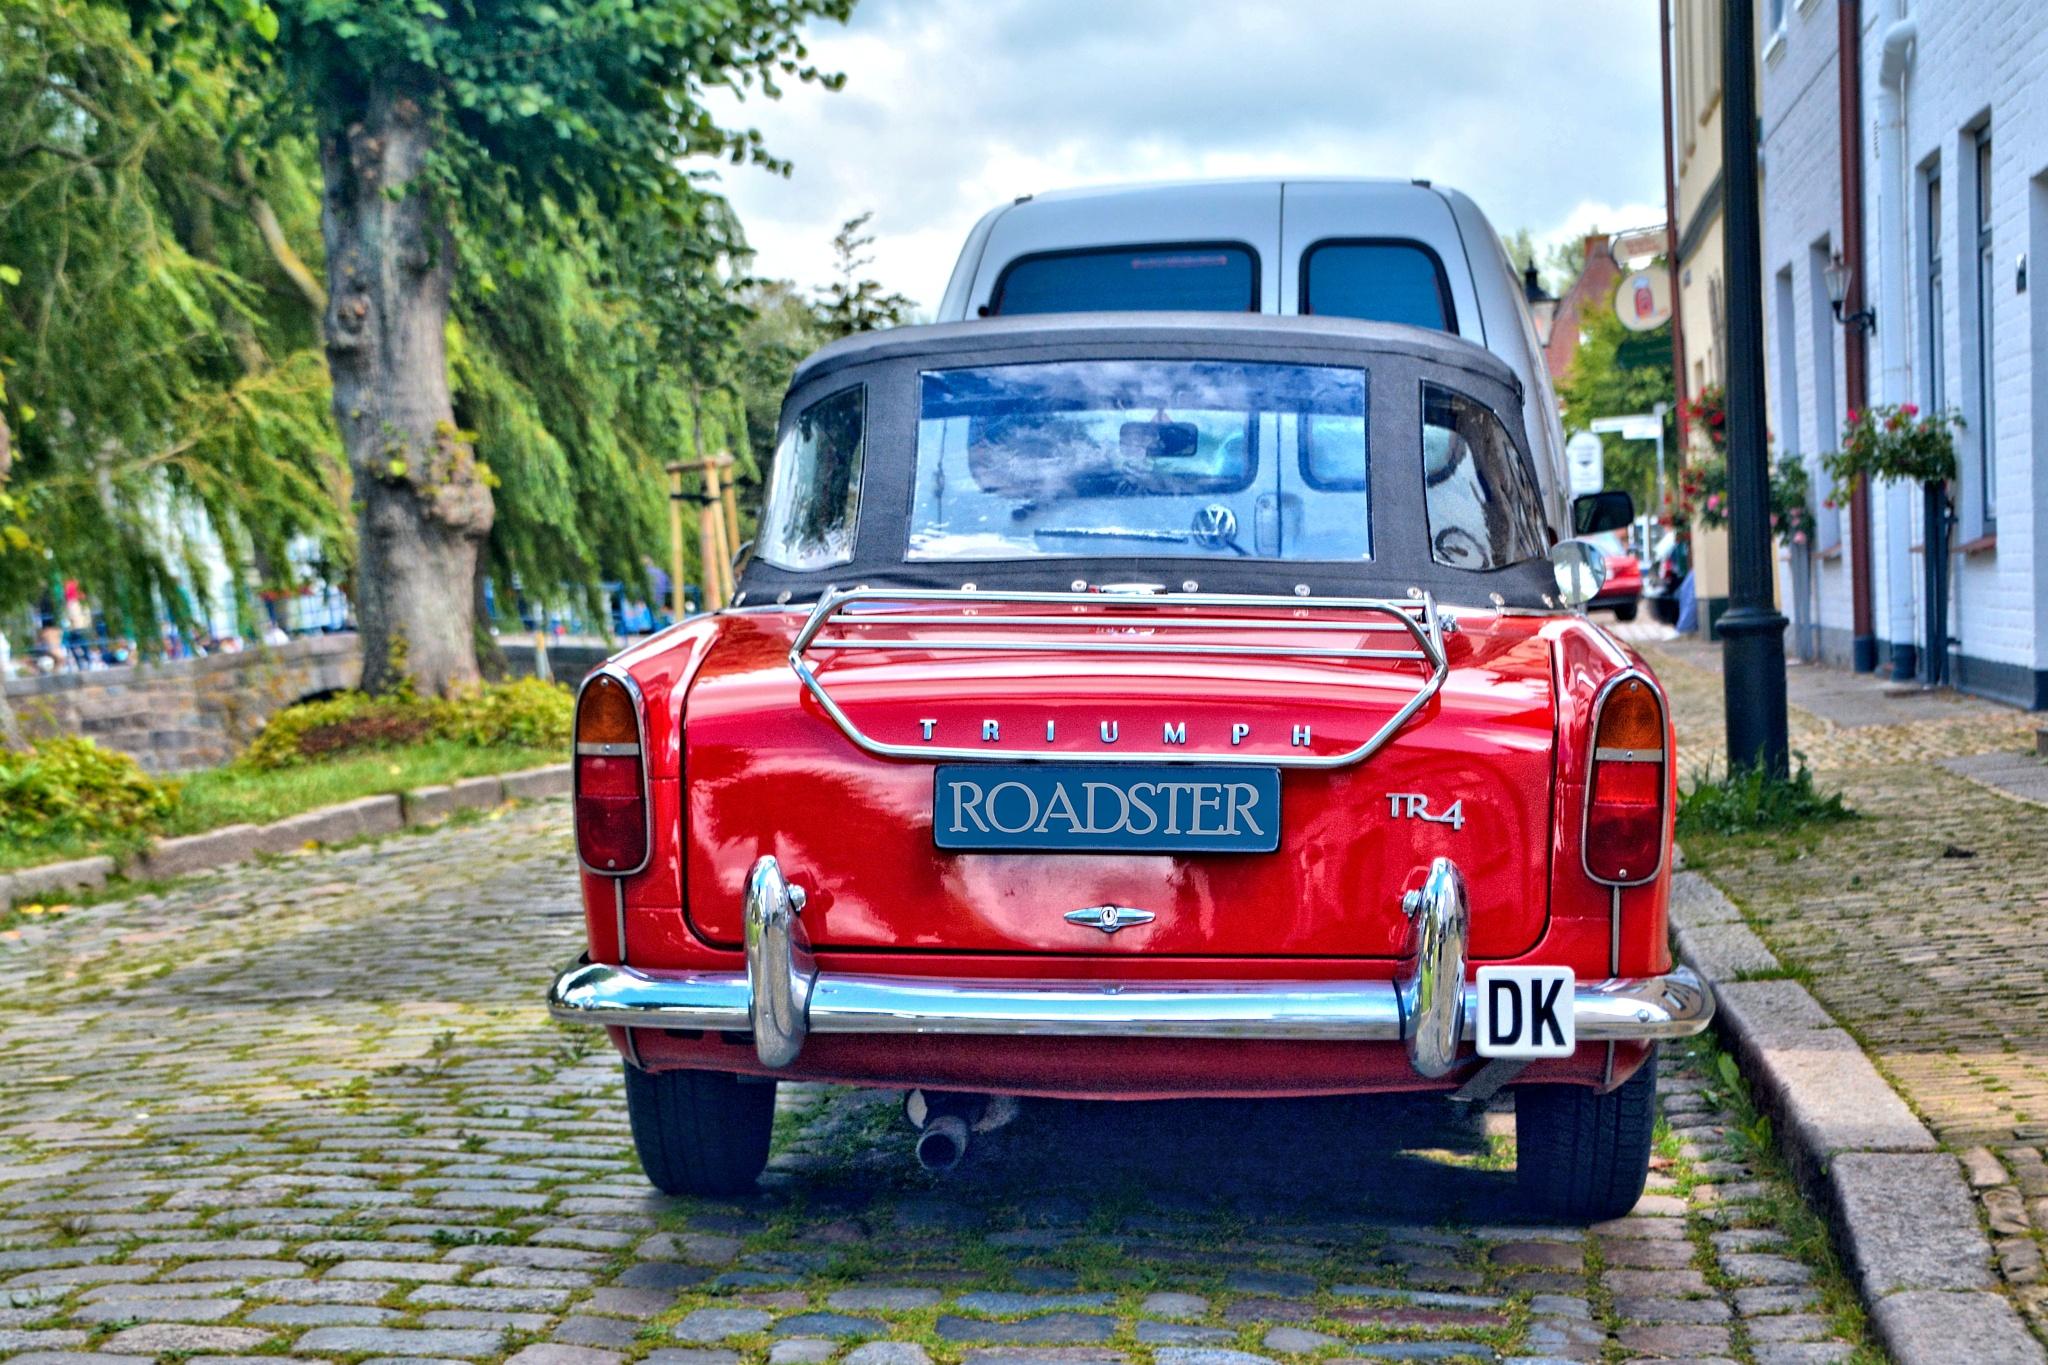 Triumpph Roadster TR4 in Friedrichstadt by RoPaFue